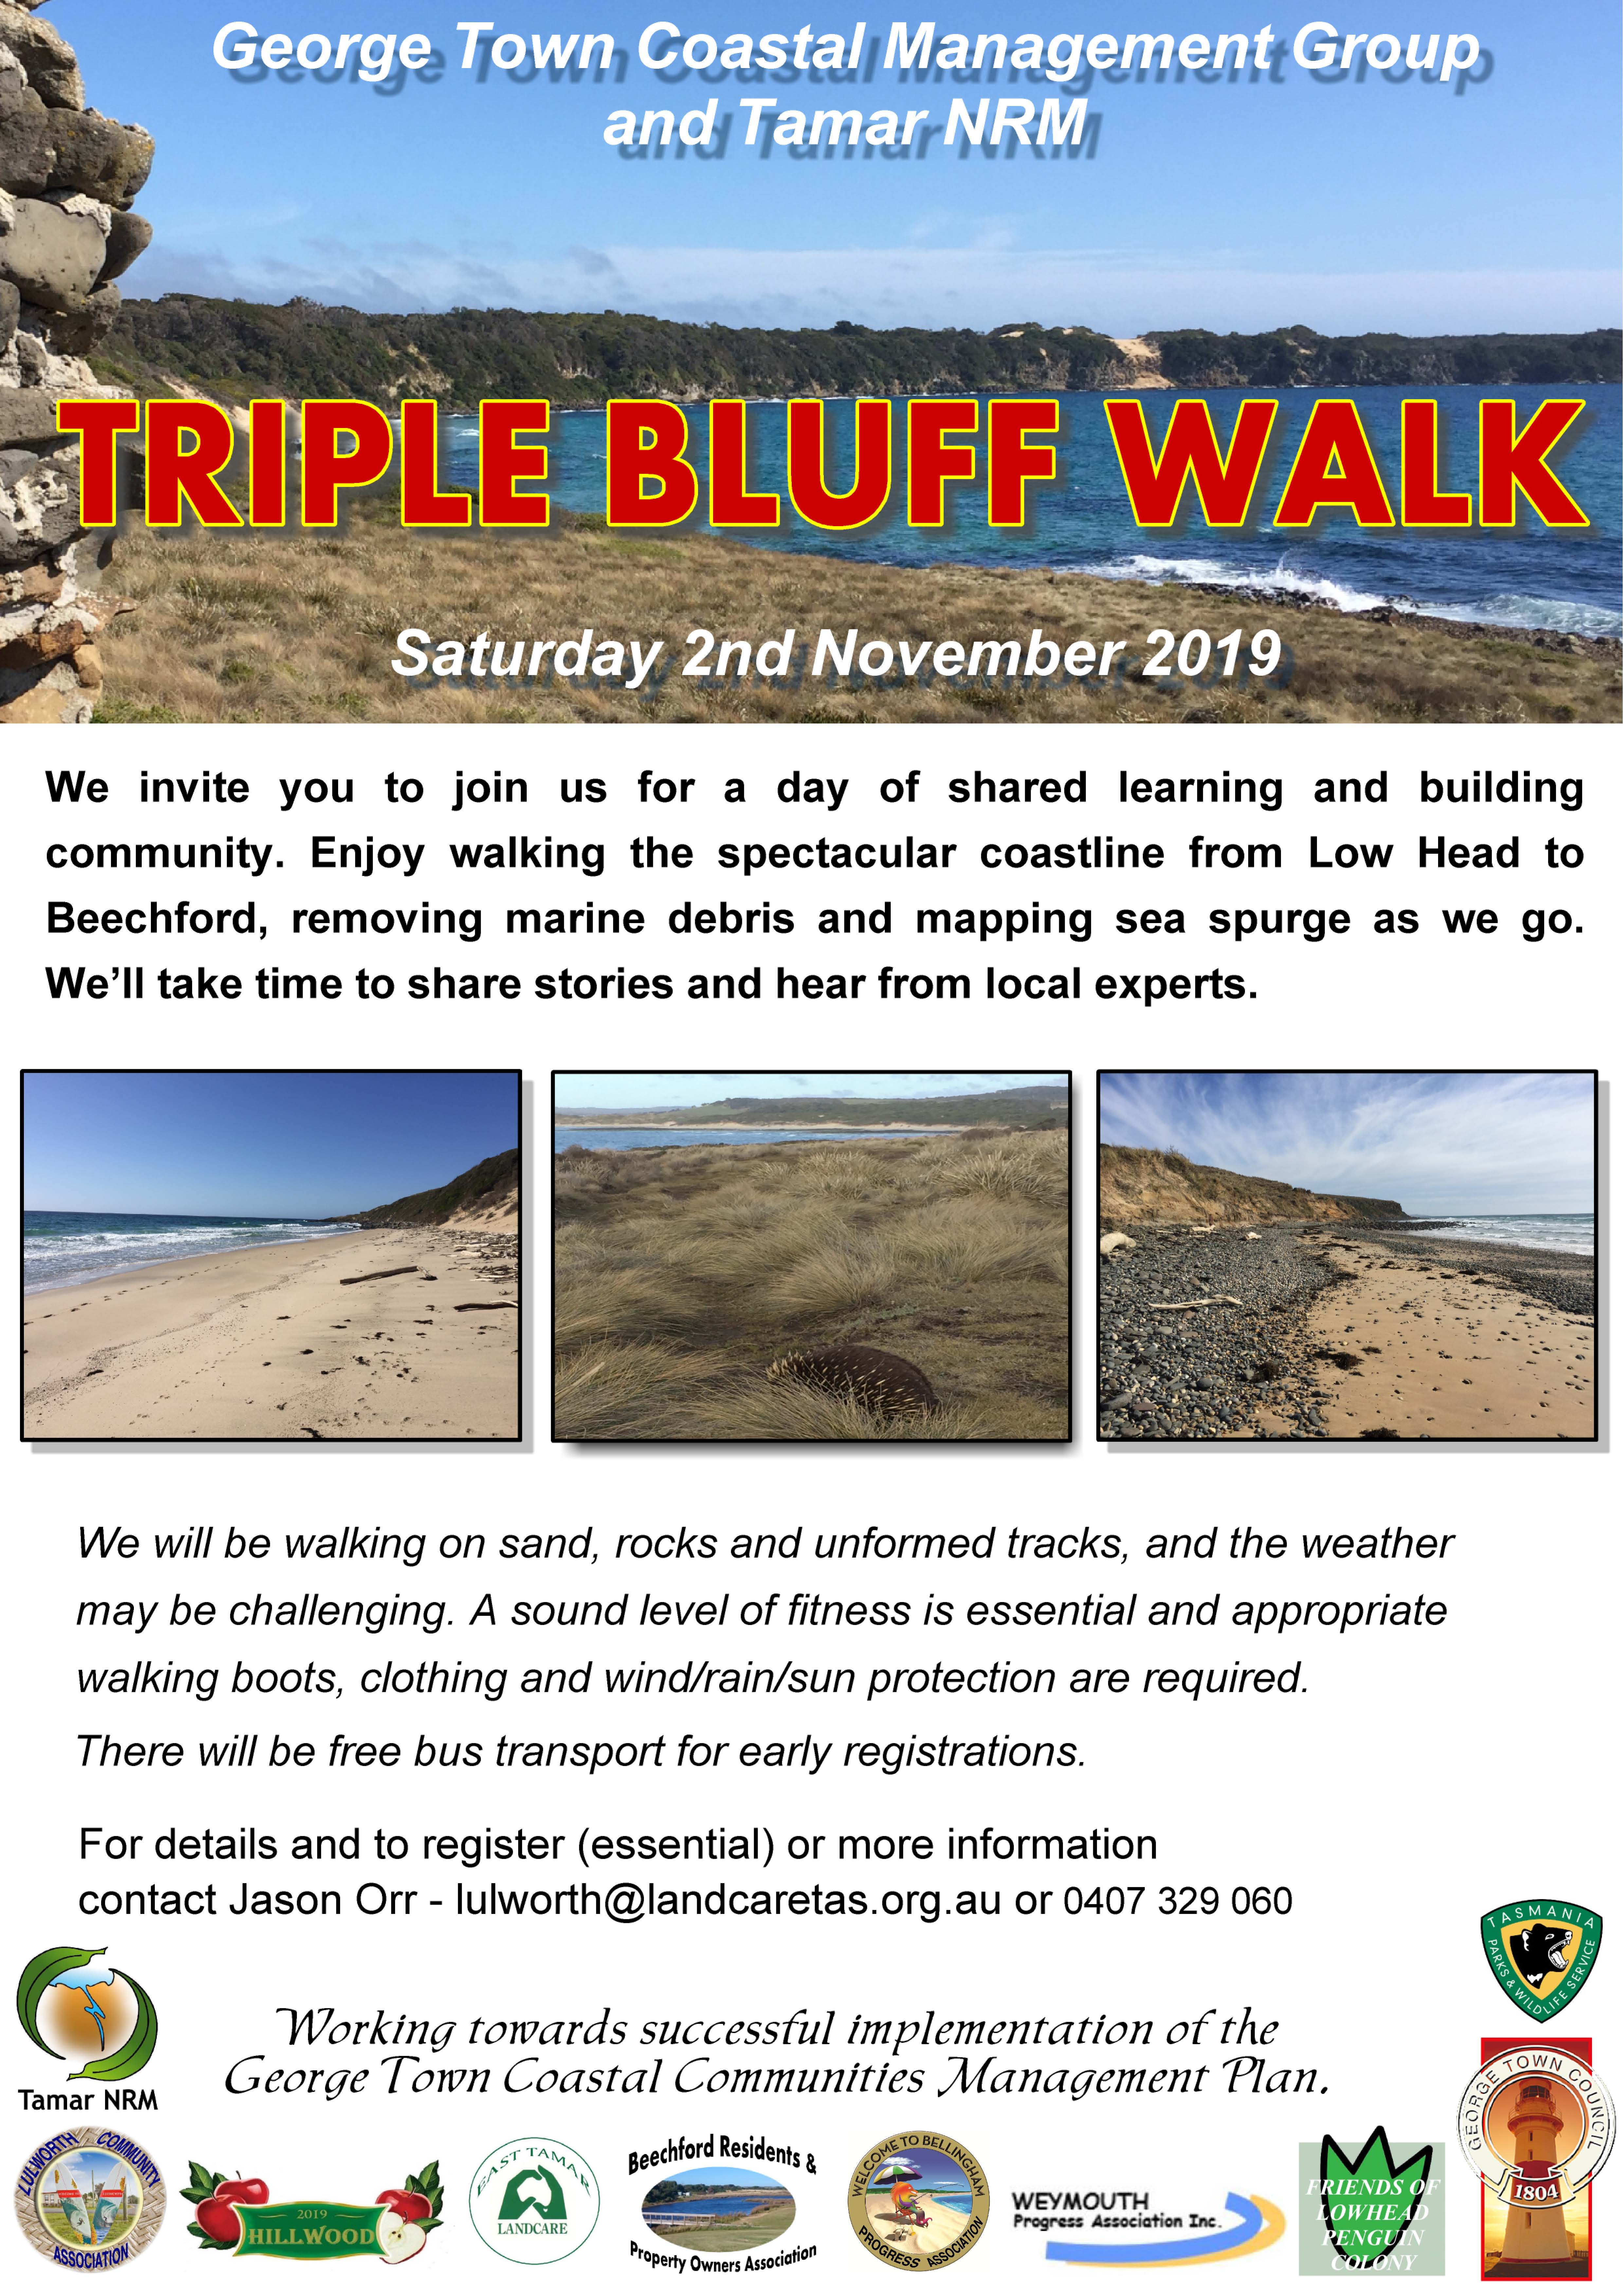 20190927_Triple_Bluff_Walk_19.jpg